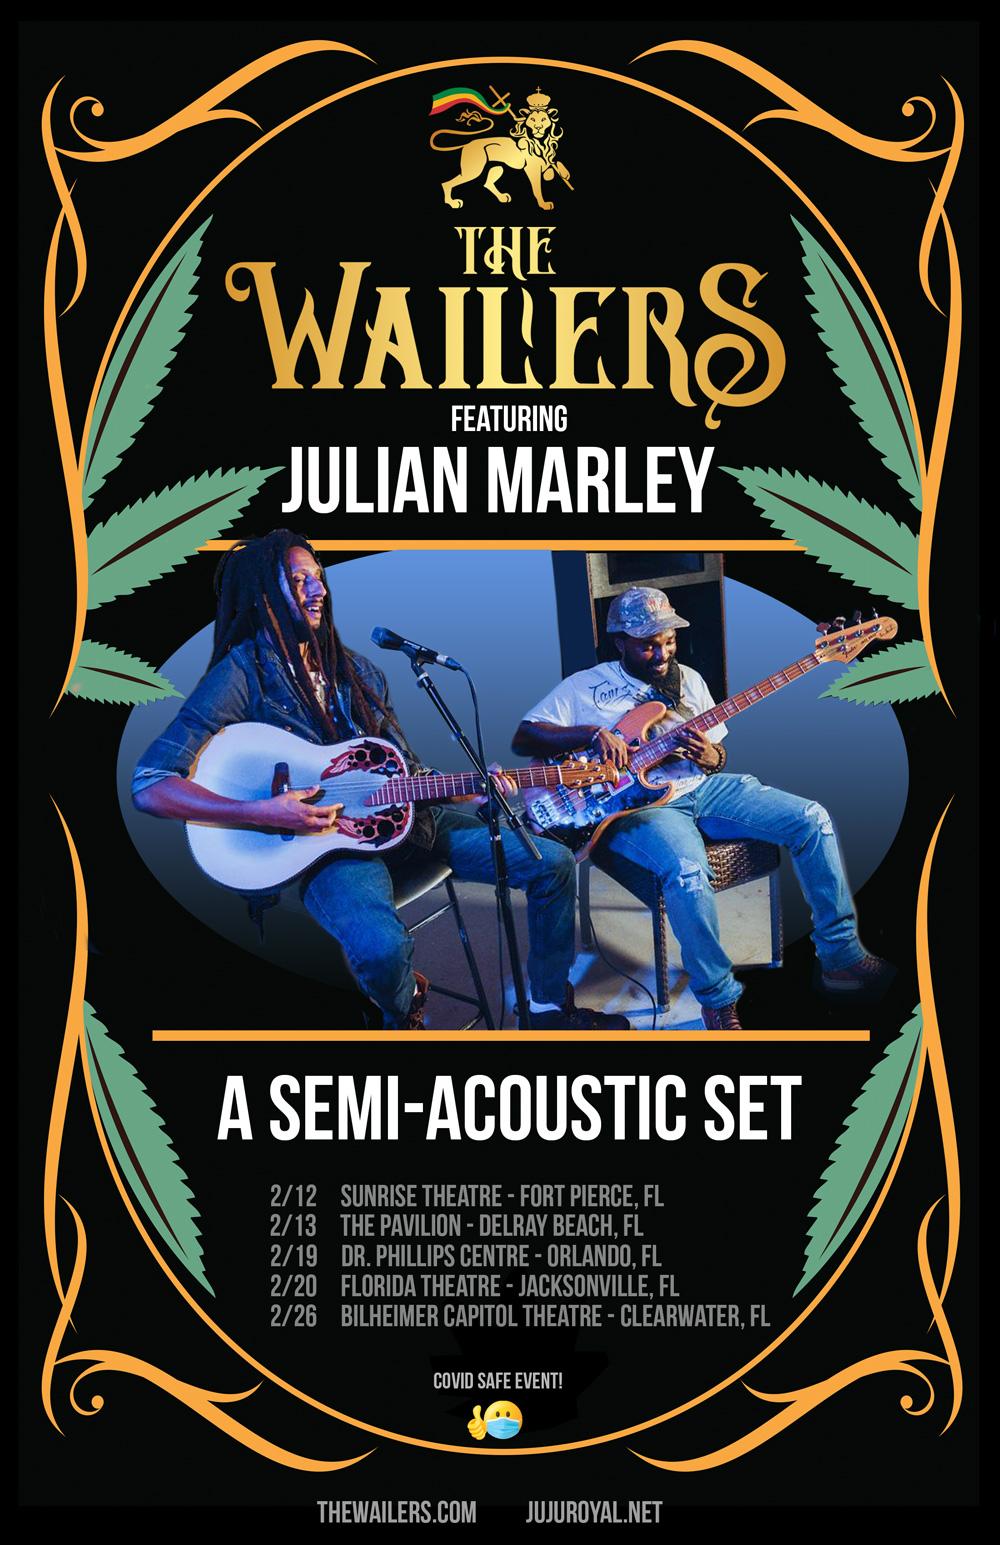 The Wailers Featuring Julian Marley